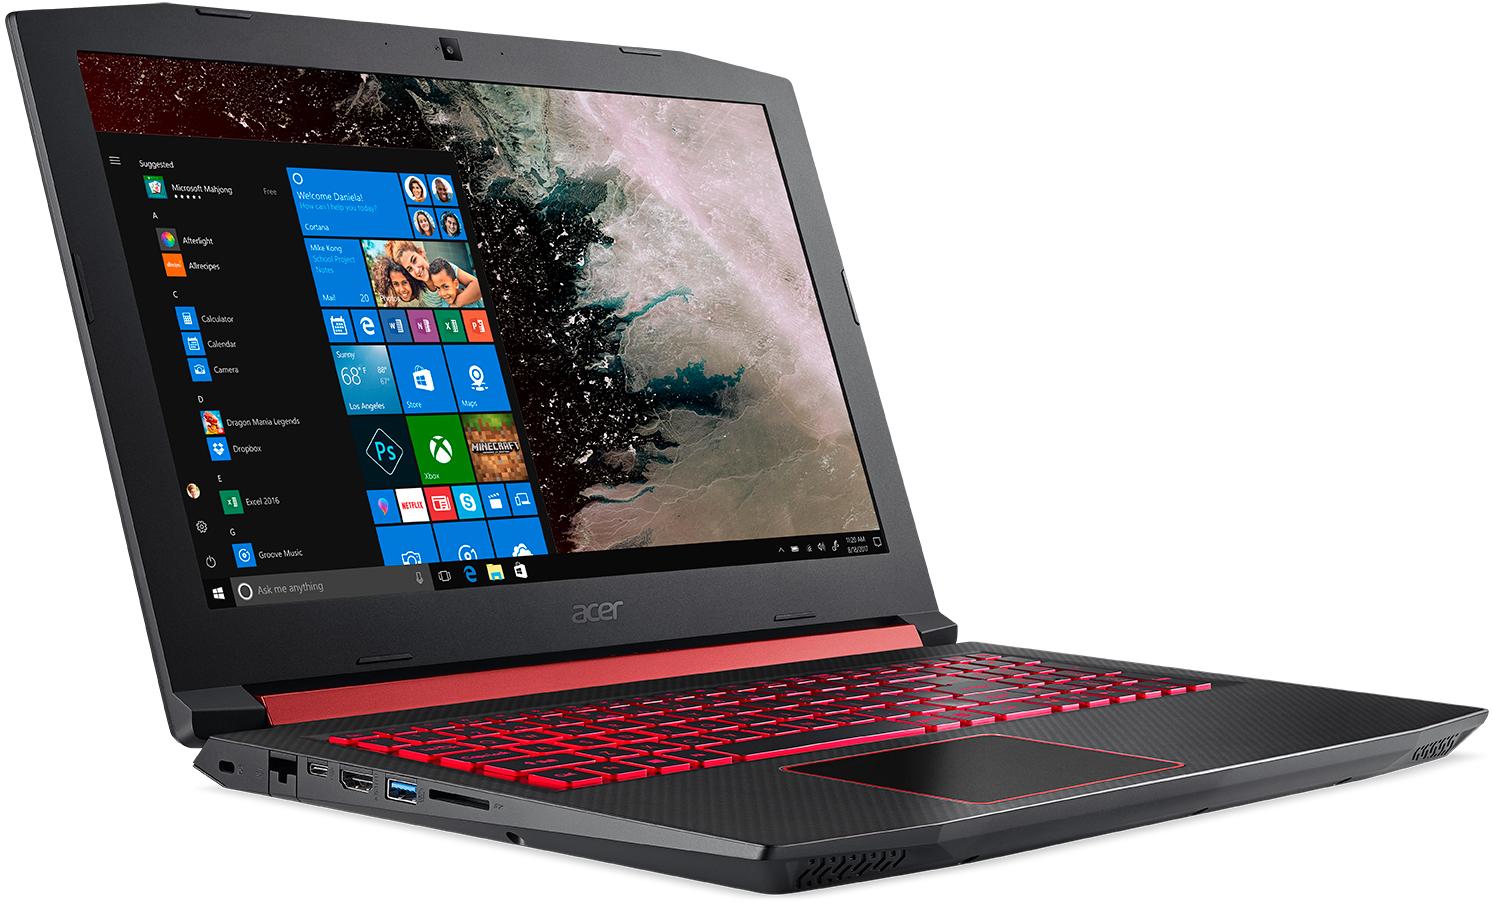 Acer Unveils Nitro 5: 15 6-inch Gaming Laptop with AMD Ryzen